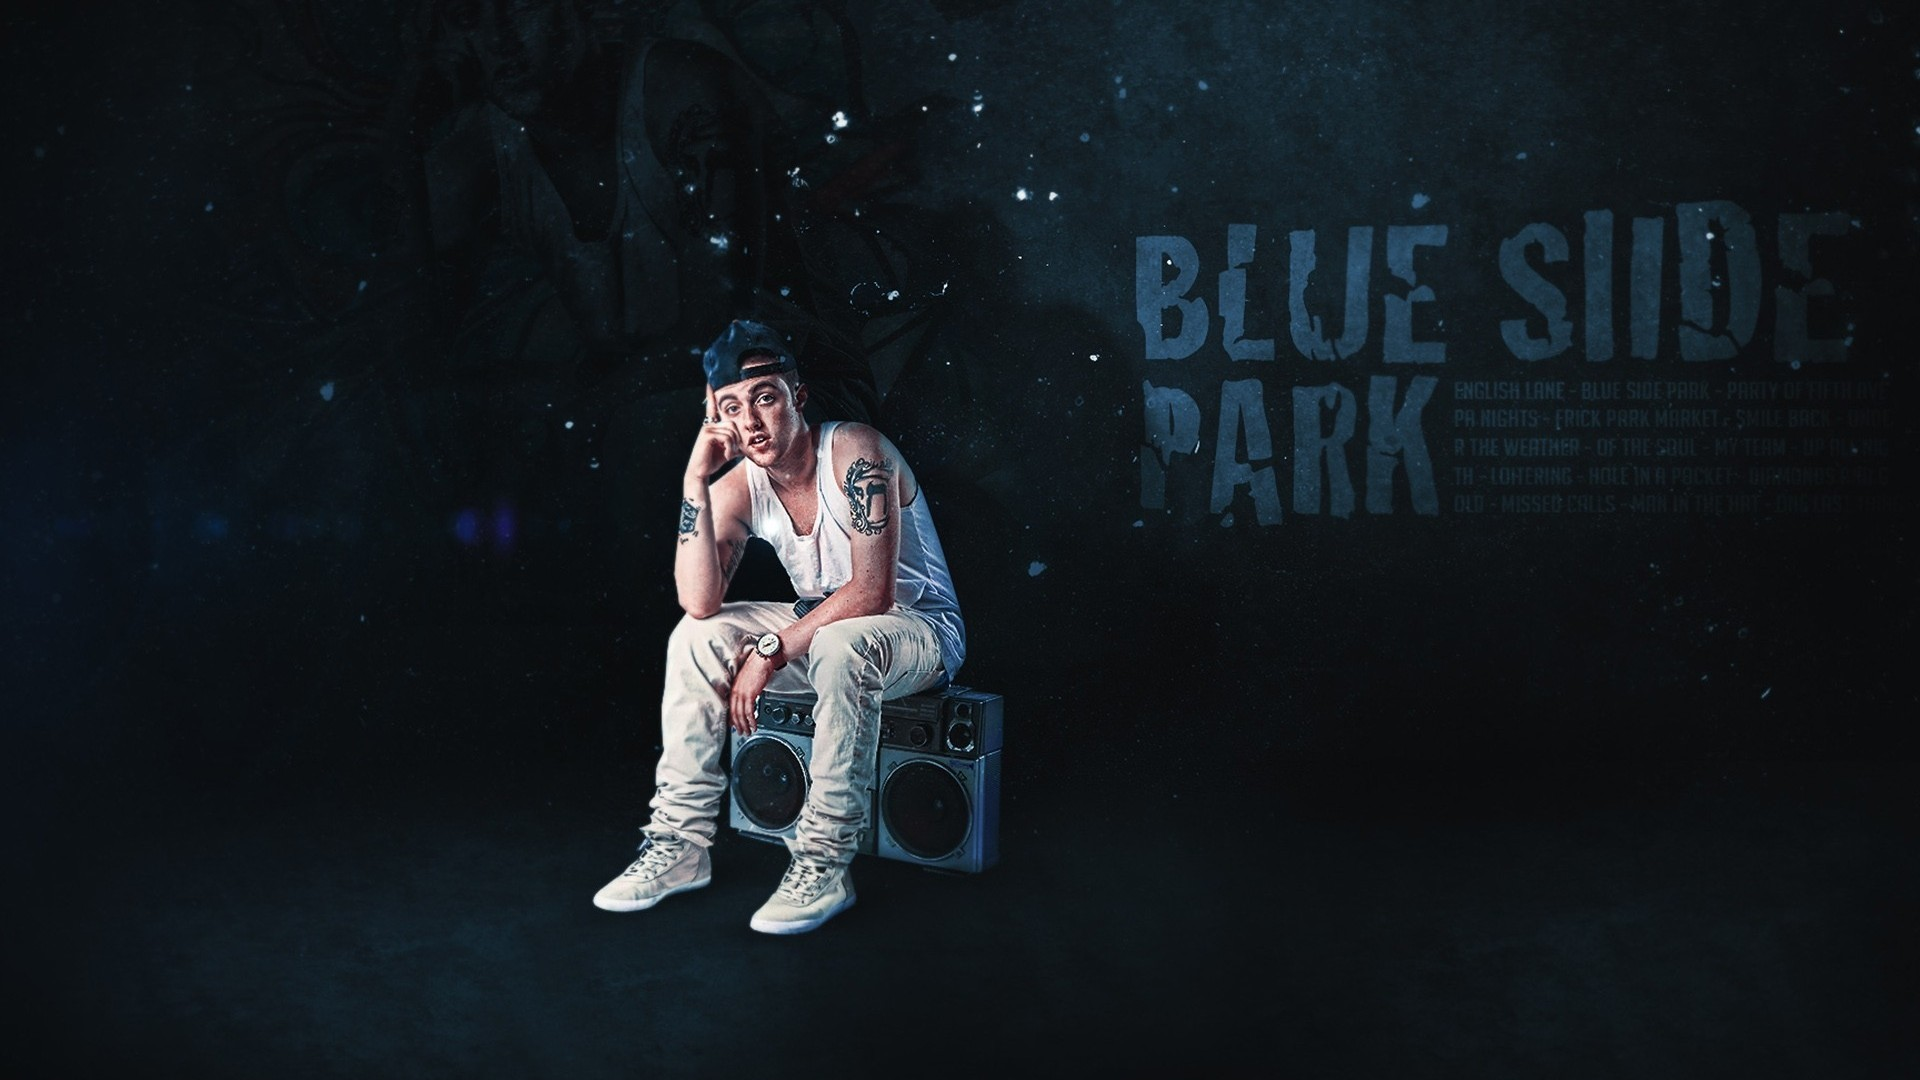 Samsung Galaxy S3 Wallpaper Quotes Mac Miller Hip Hop Singer Hd Wallpaper